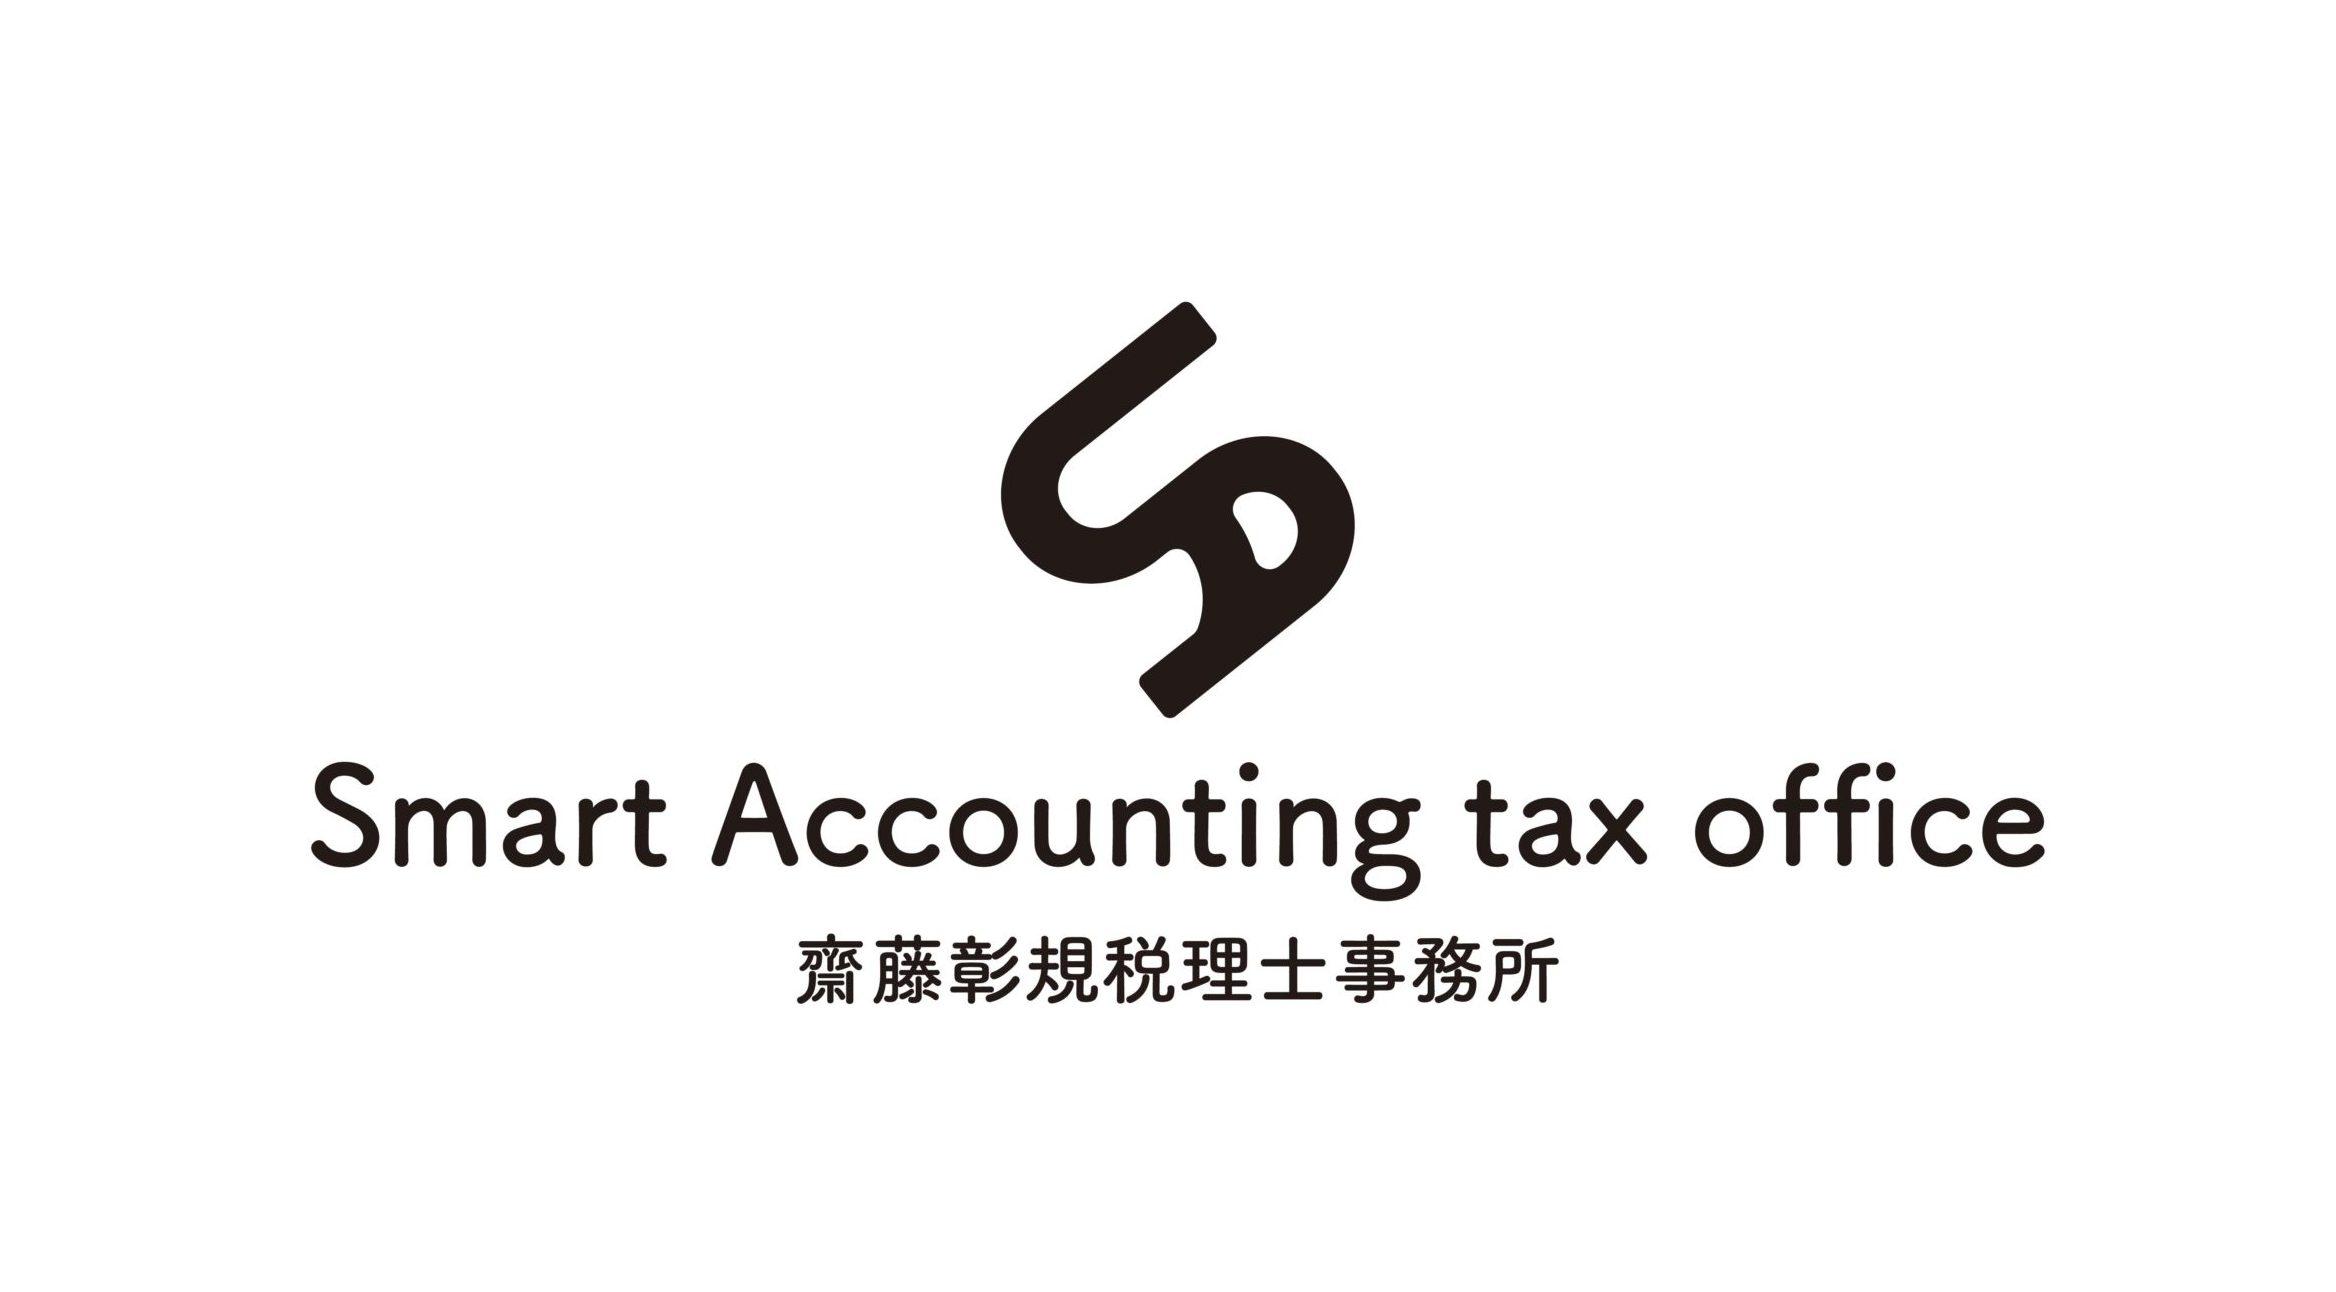 齋藤彰規税理士事務所 -Smart Accounting tax office-